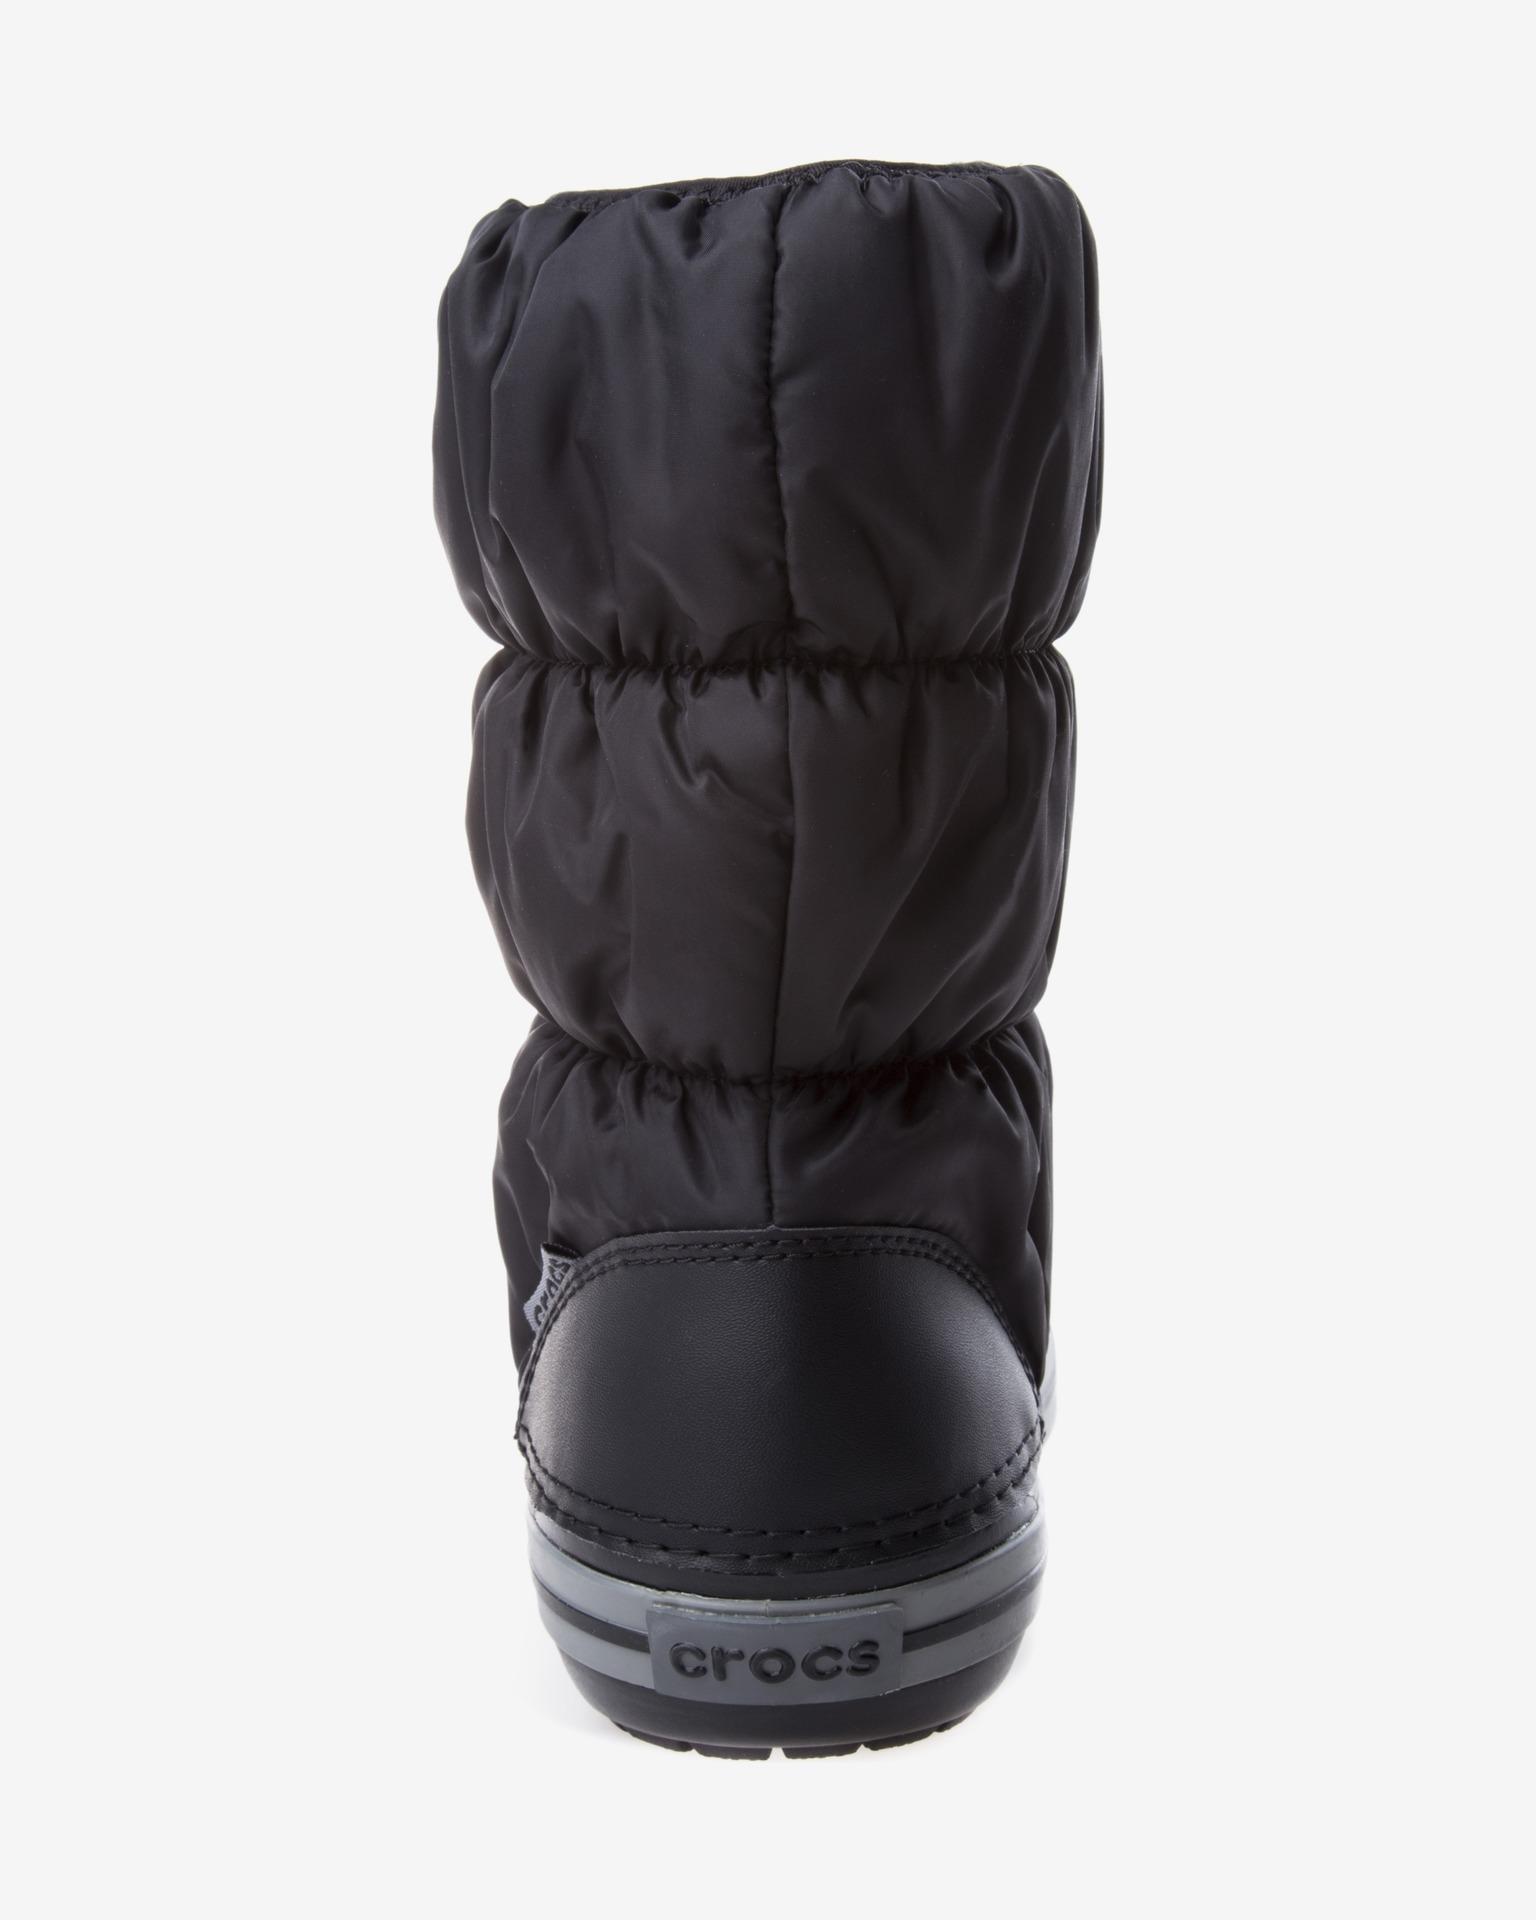 Crocs - Winter Puff Hótaposó  c6d1dbf16f